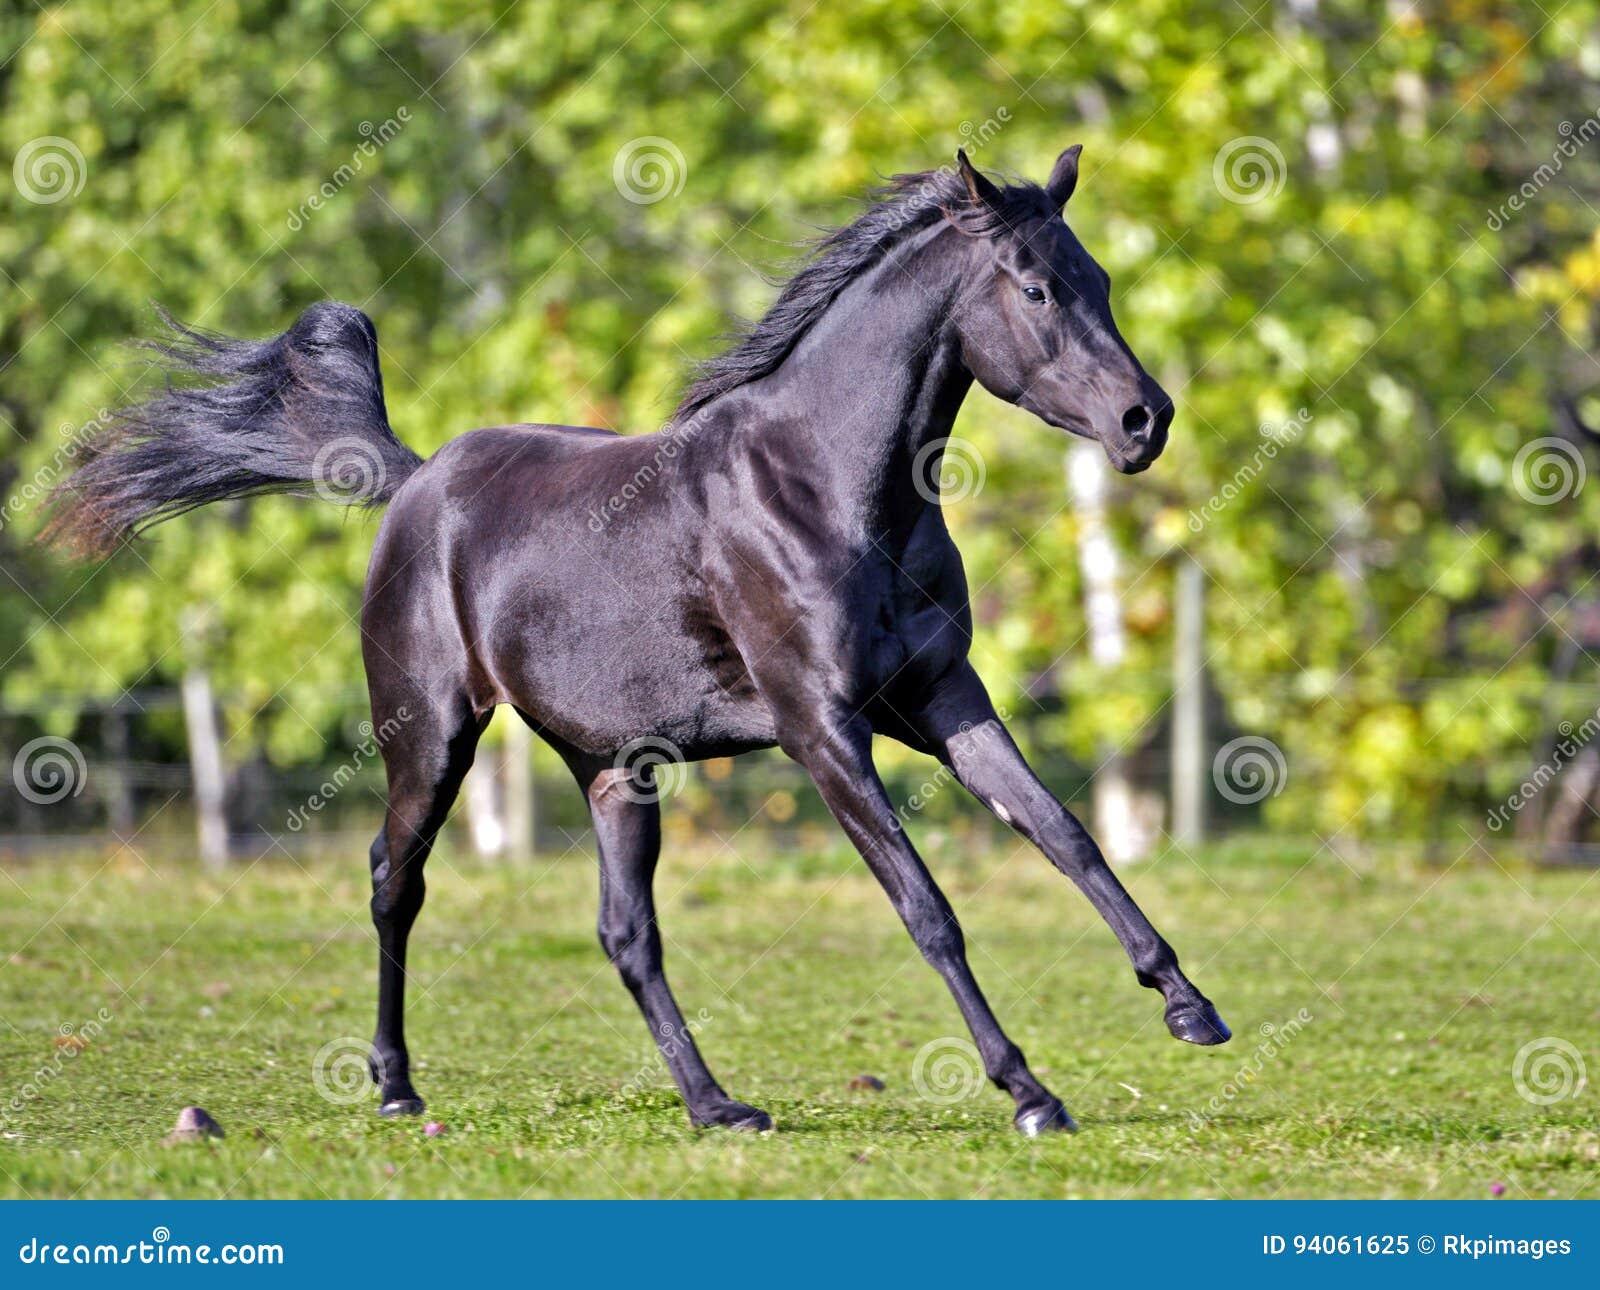 4 763 Black Arabian Horse Photos Free Royalty Free Stock Photos From Dreamstime